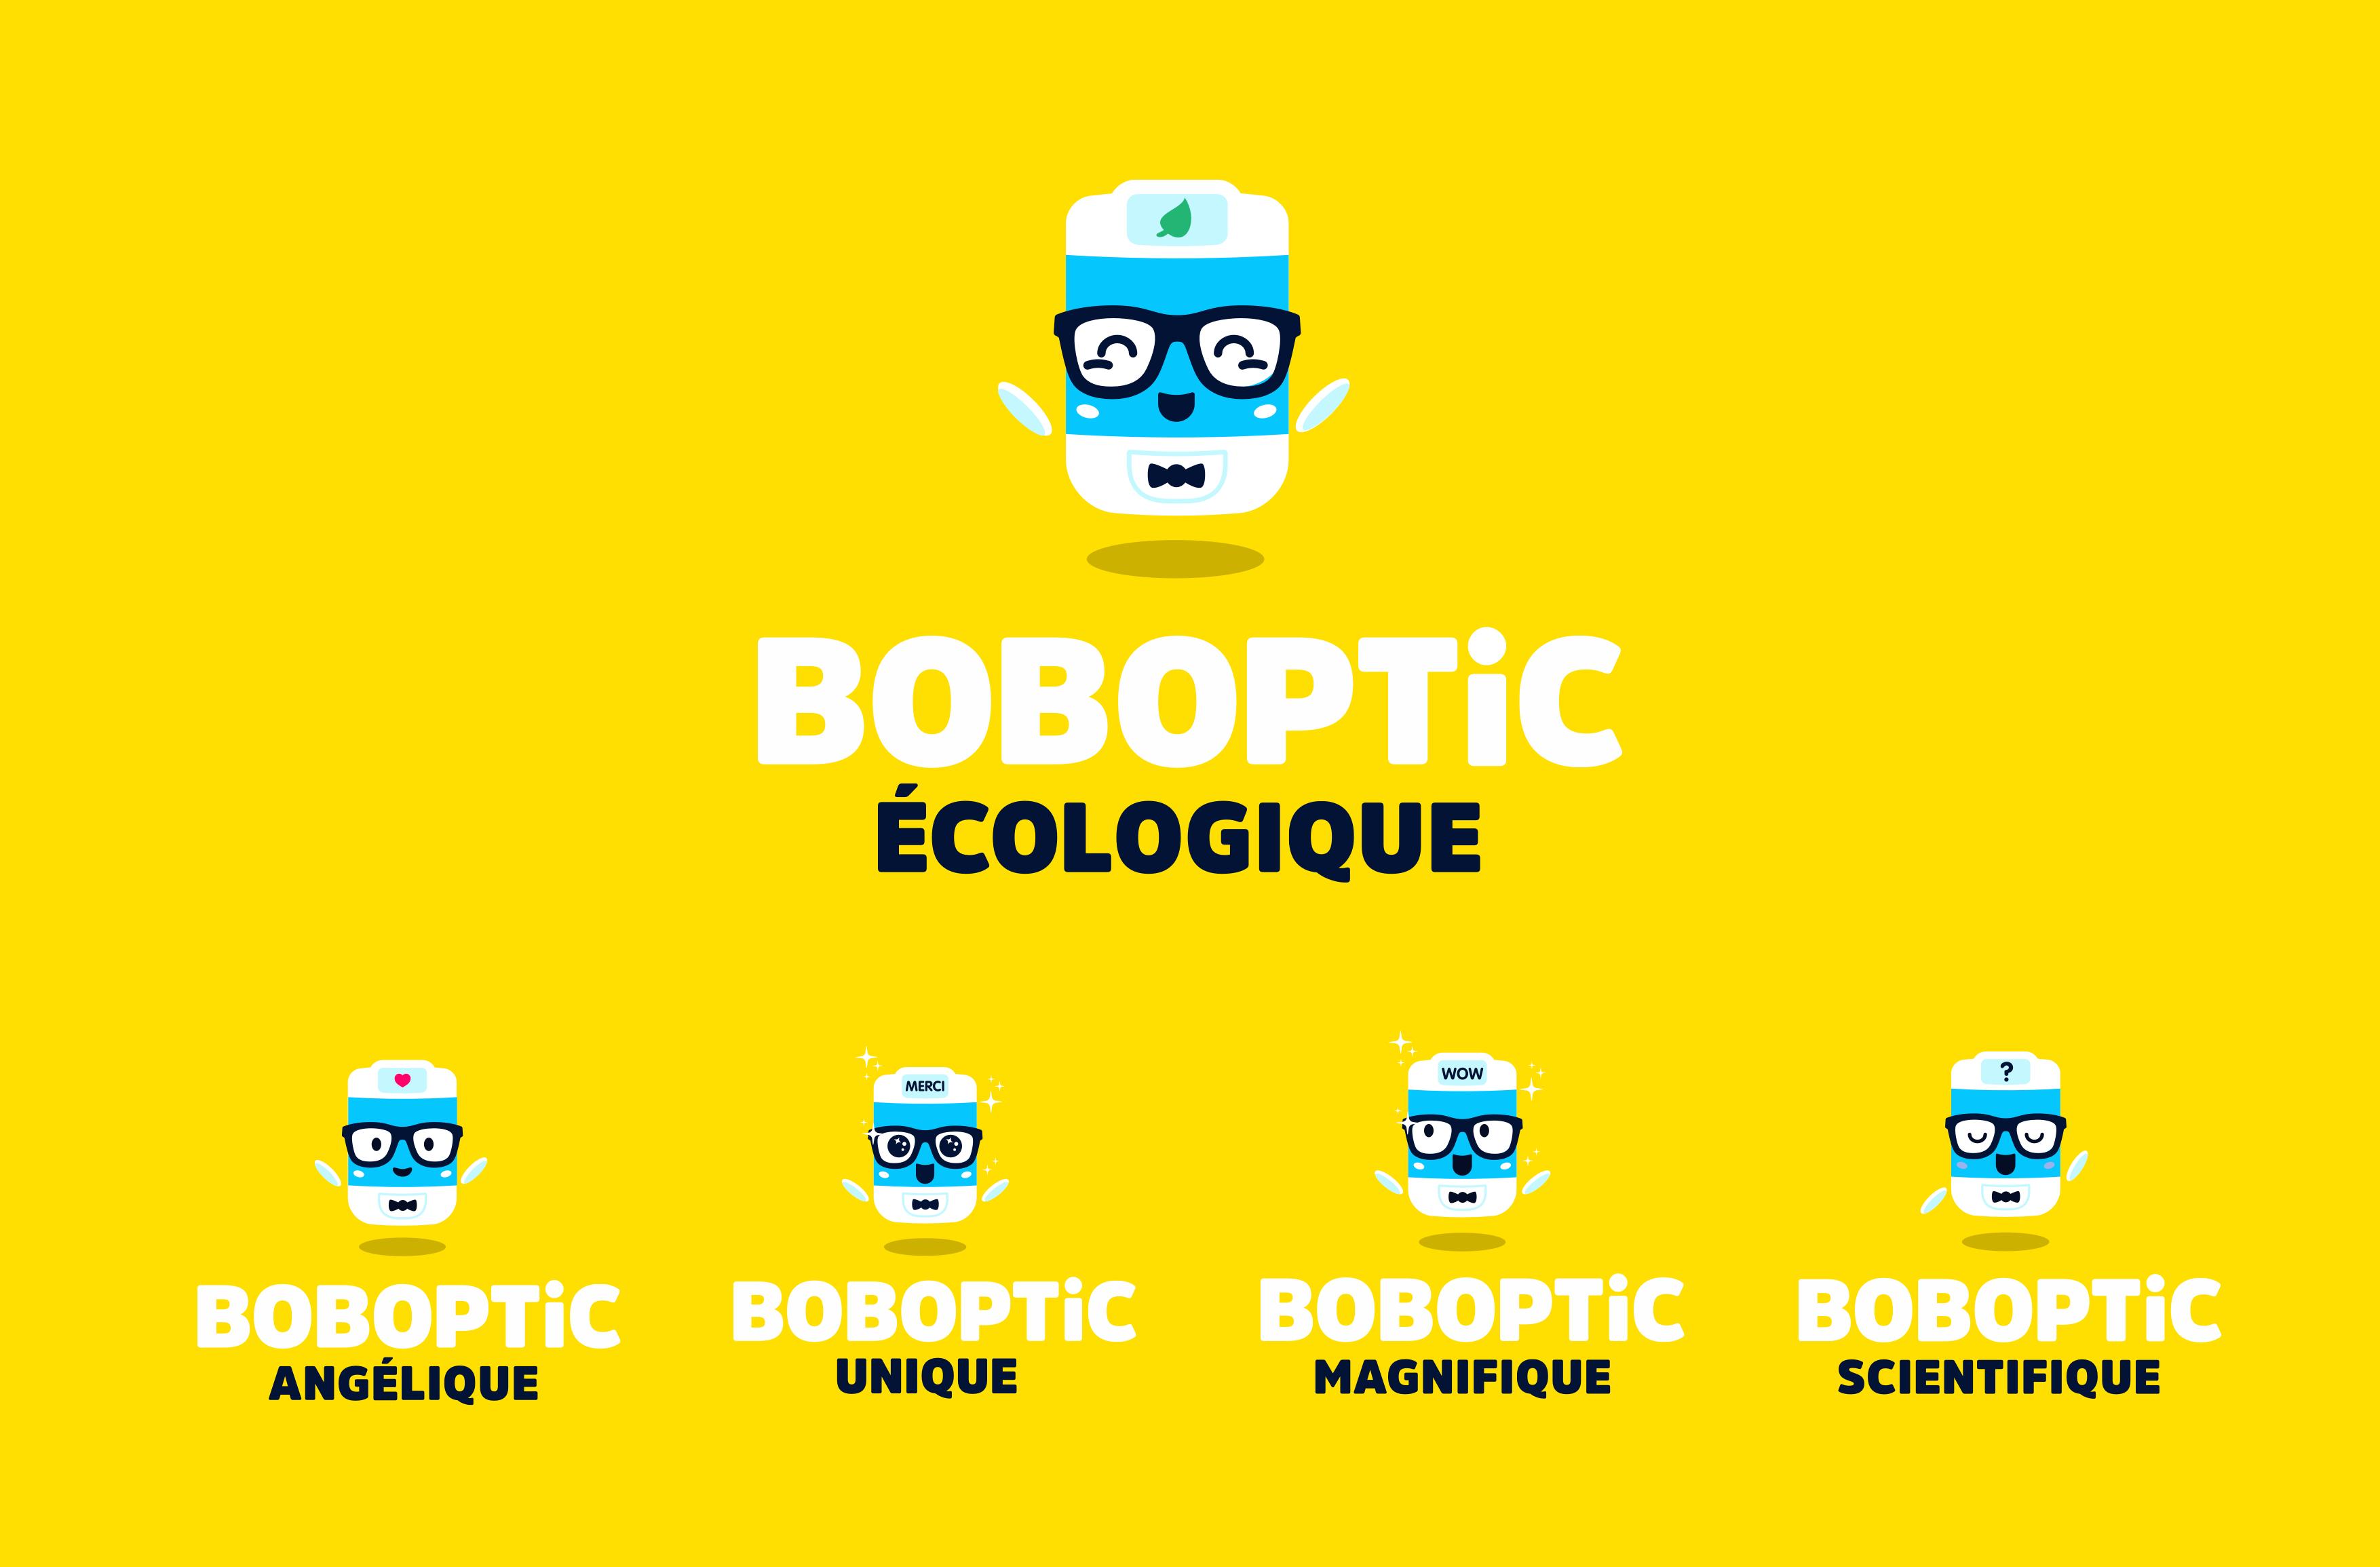 12 – Ecologiqueboboptic